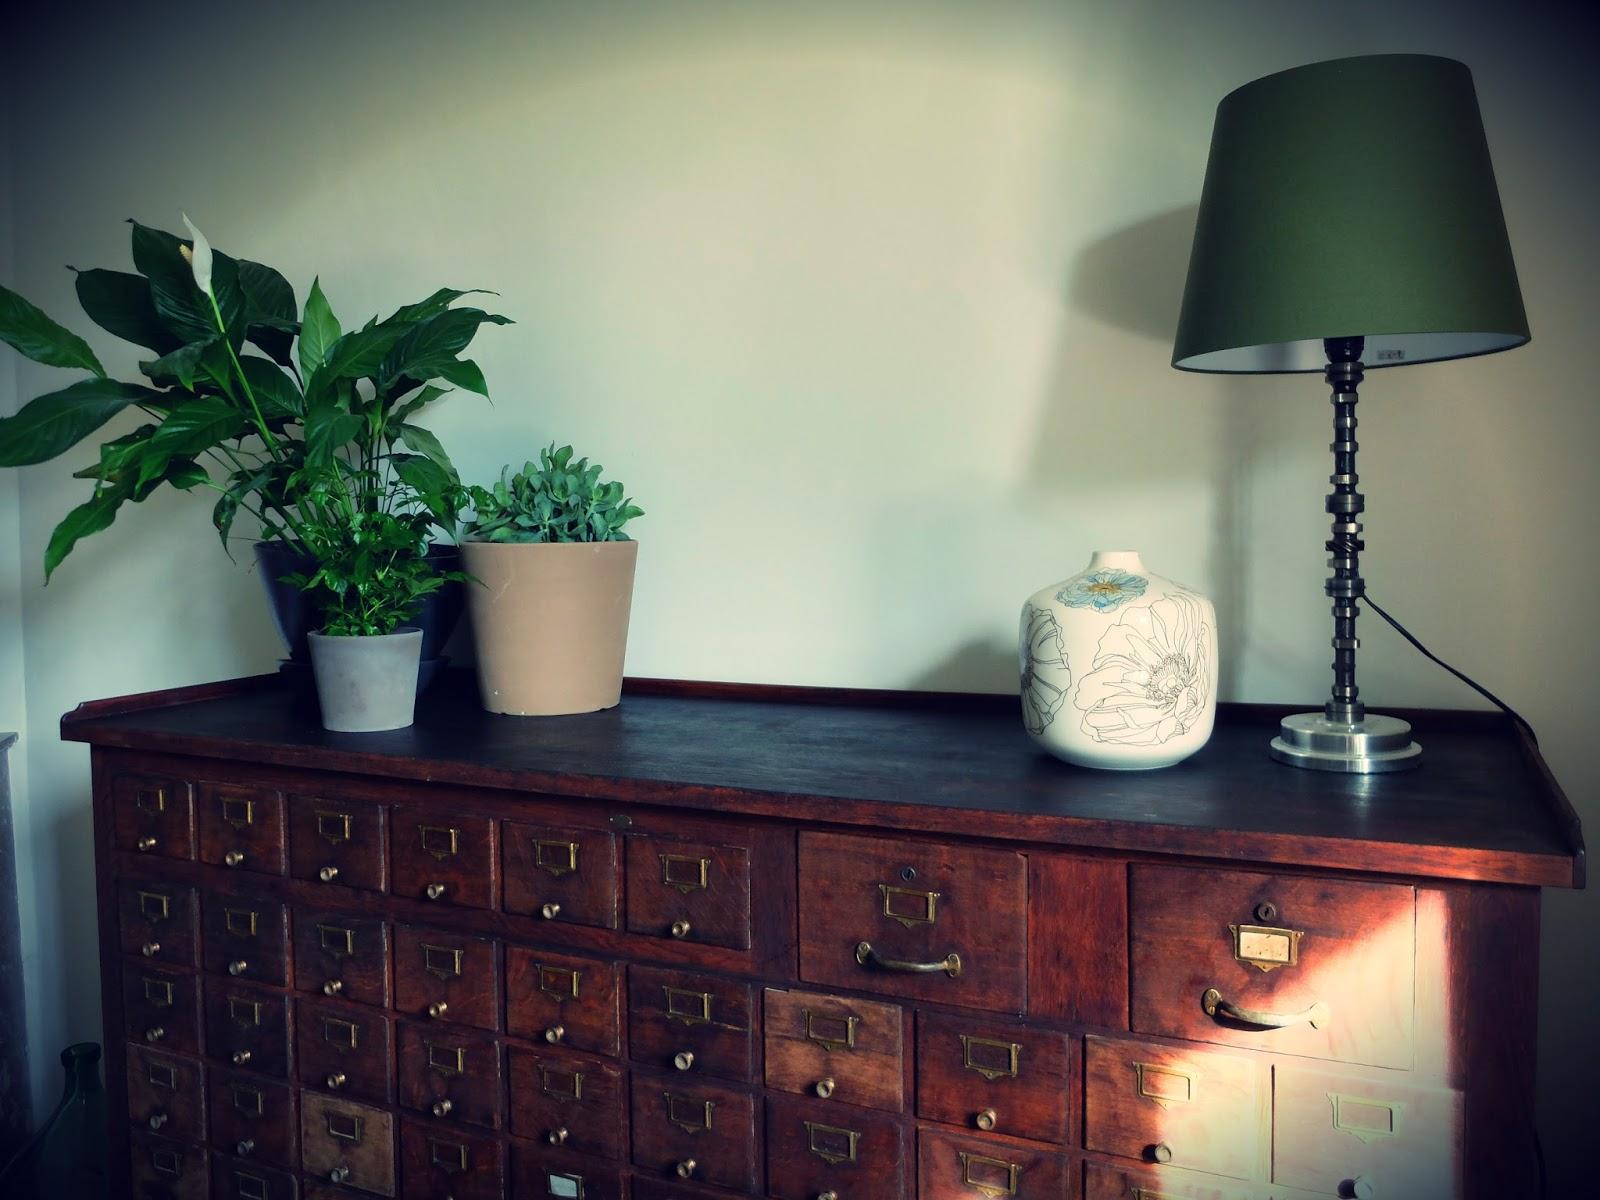 Restaurer un meuble ancien madame d core for Restaurer vieux meuble